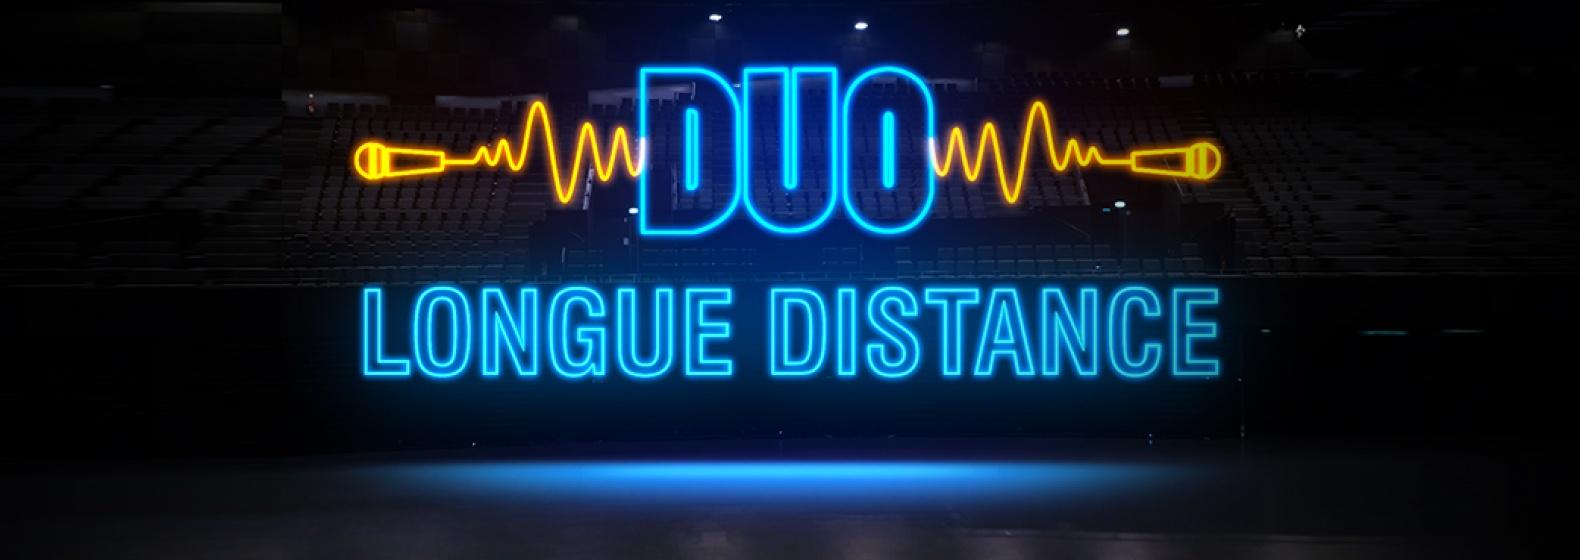 duo_longue_distance_r.jpg